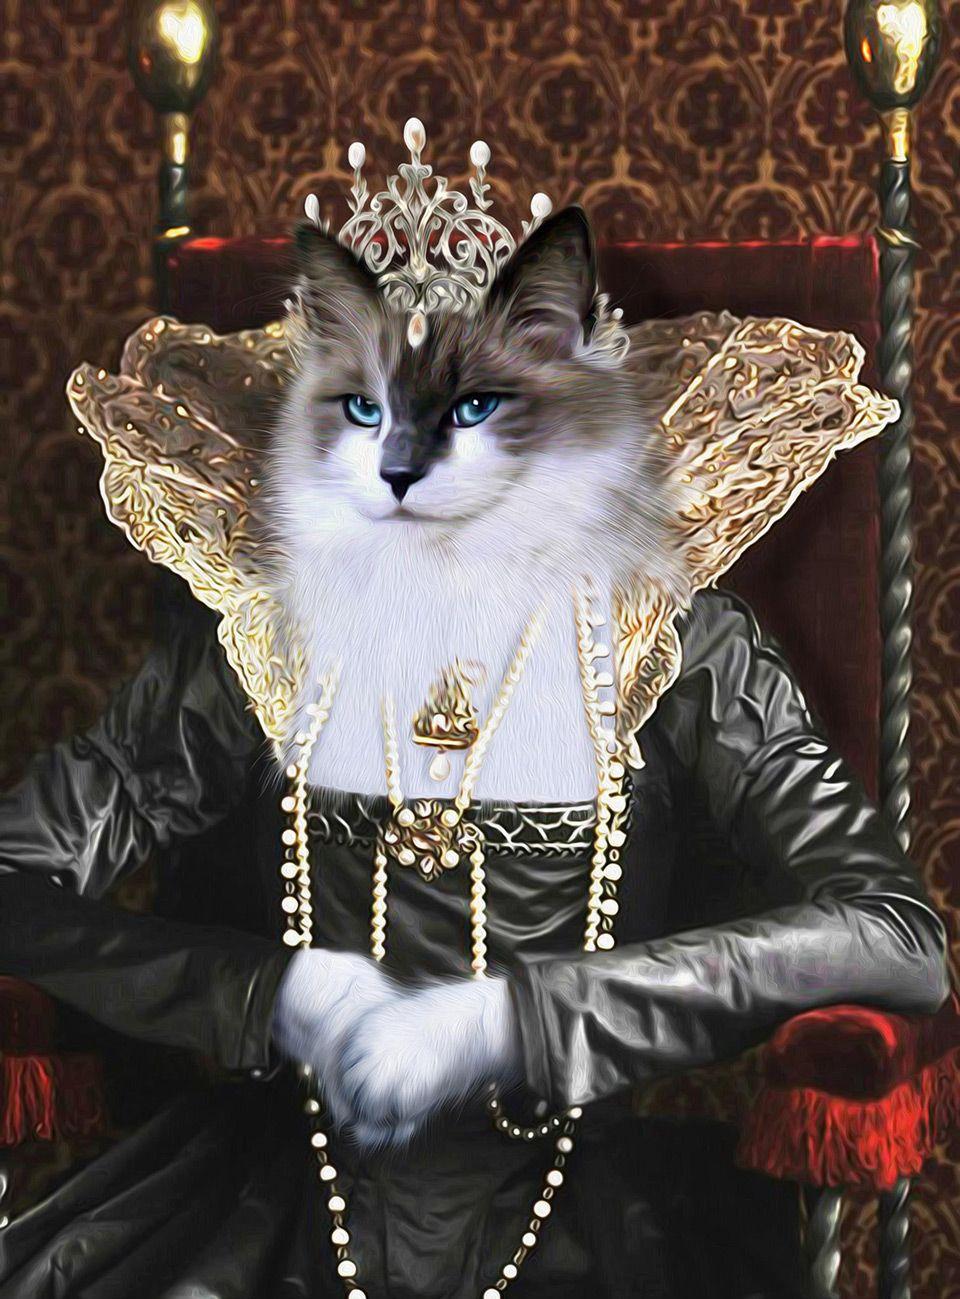 """Skyler"" by Pompous Pets from Sydney, Australia Cats"